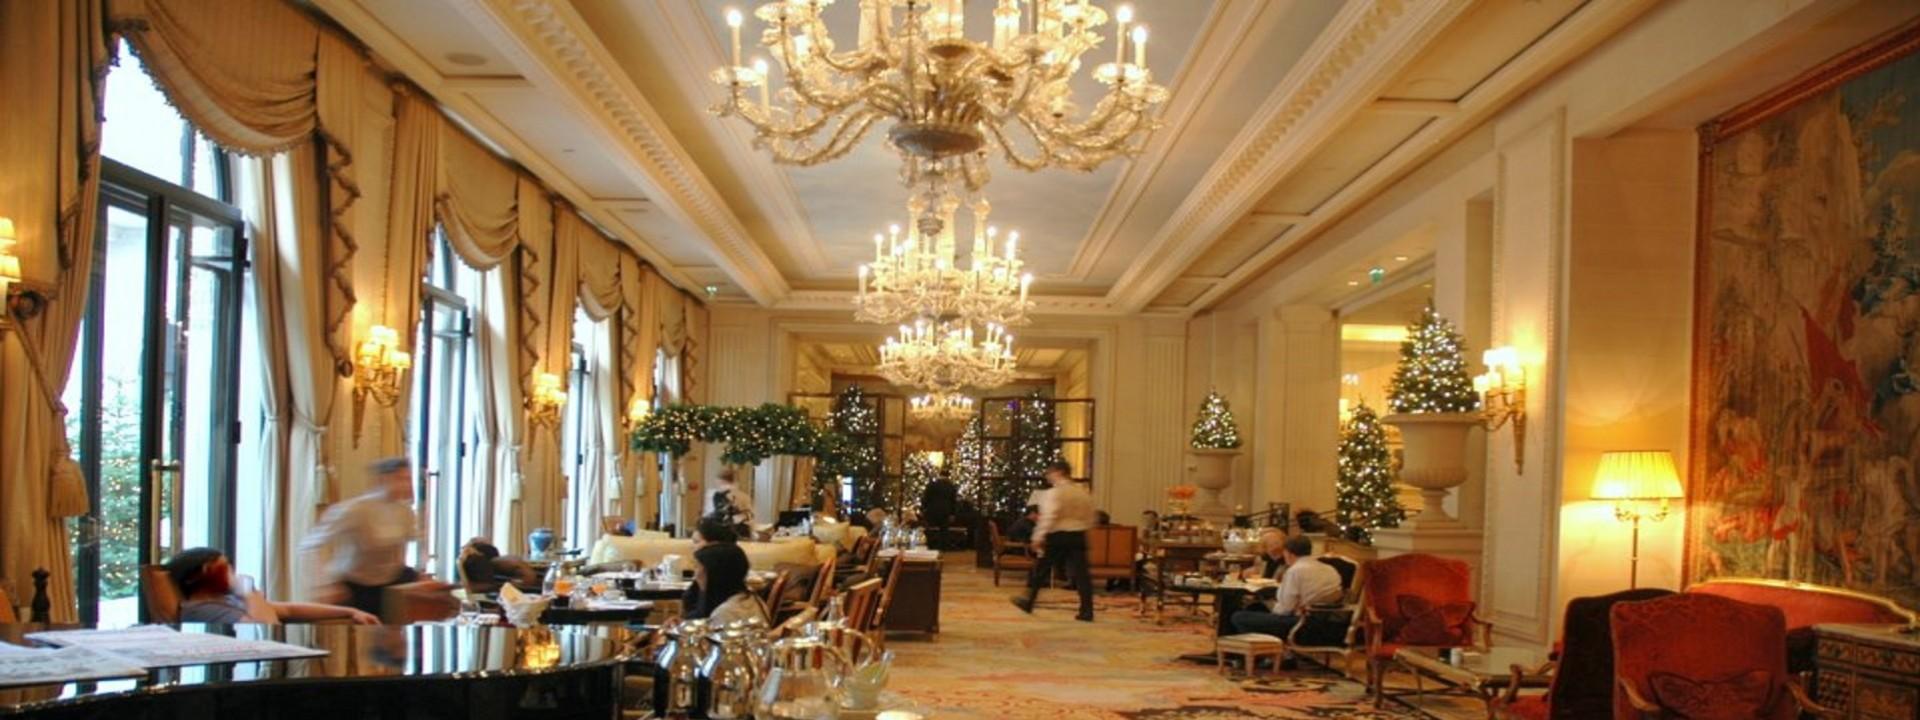 Hotels Energy & Sustainability Services